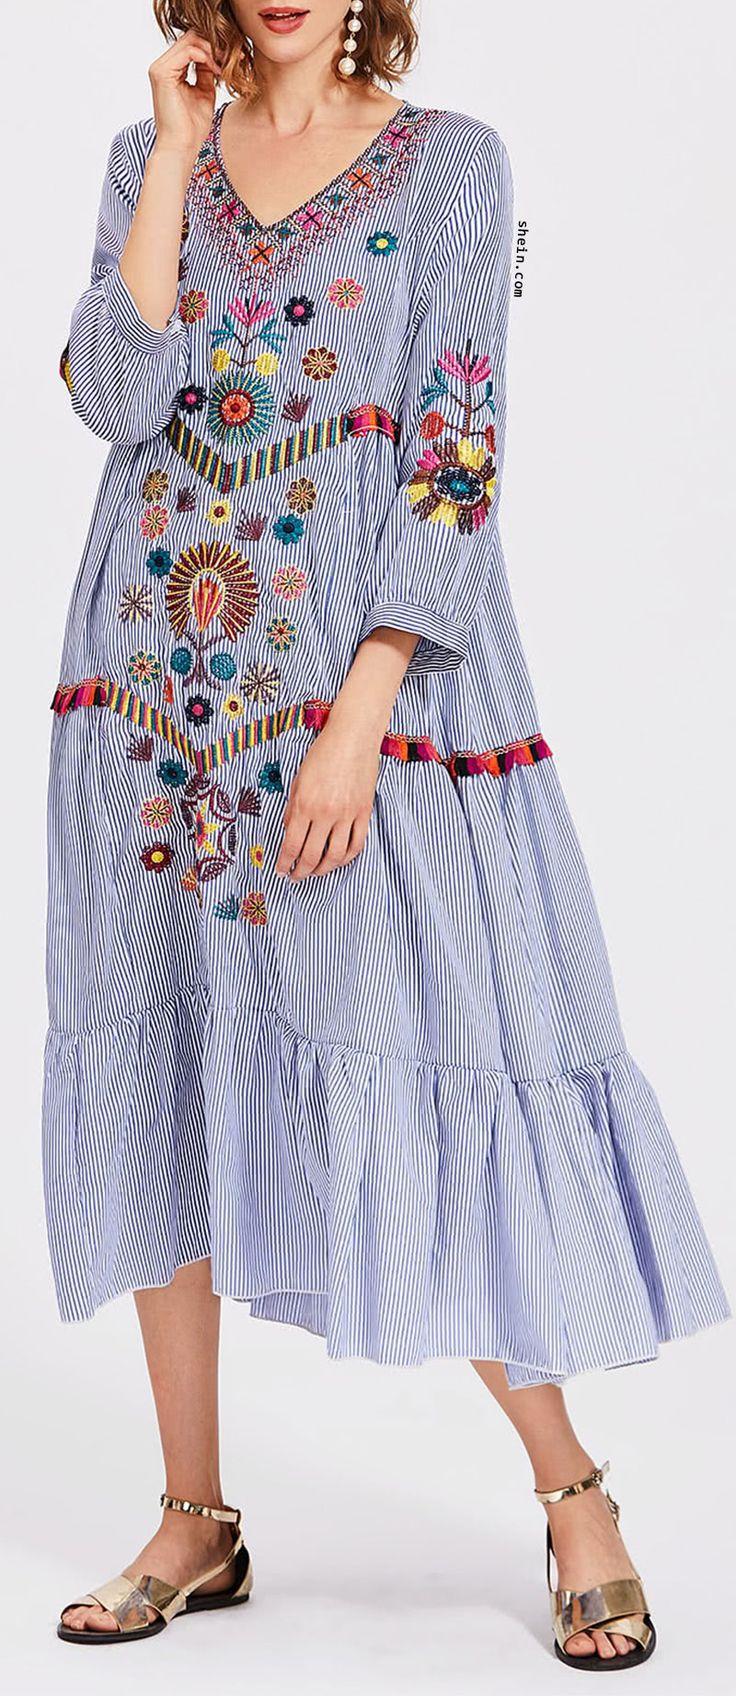 Vertical Striped Flower Embroidered Frill Hem Dress